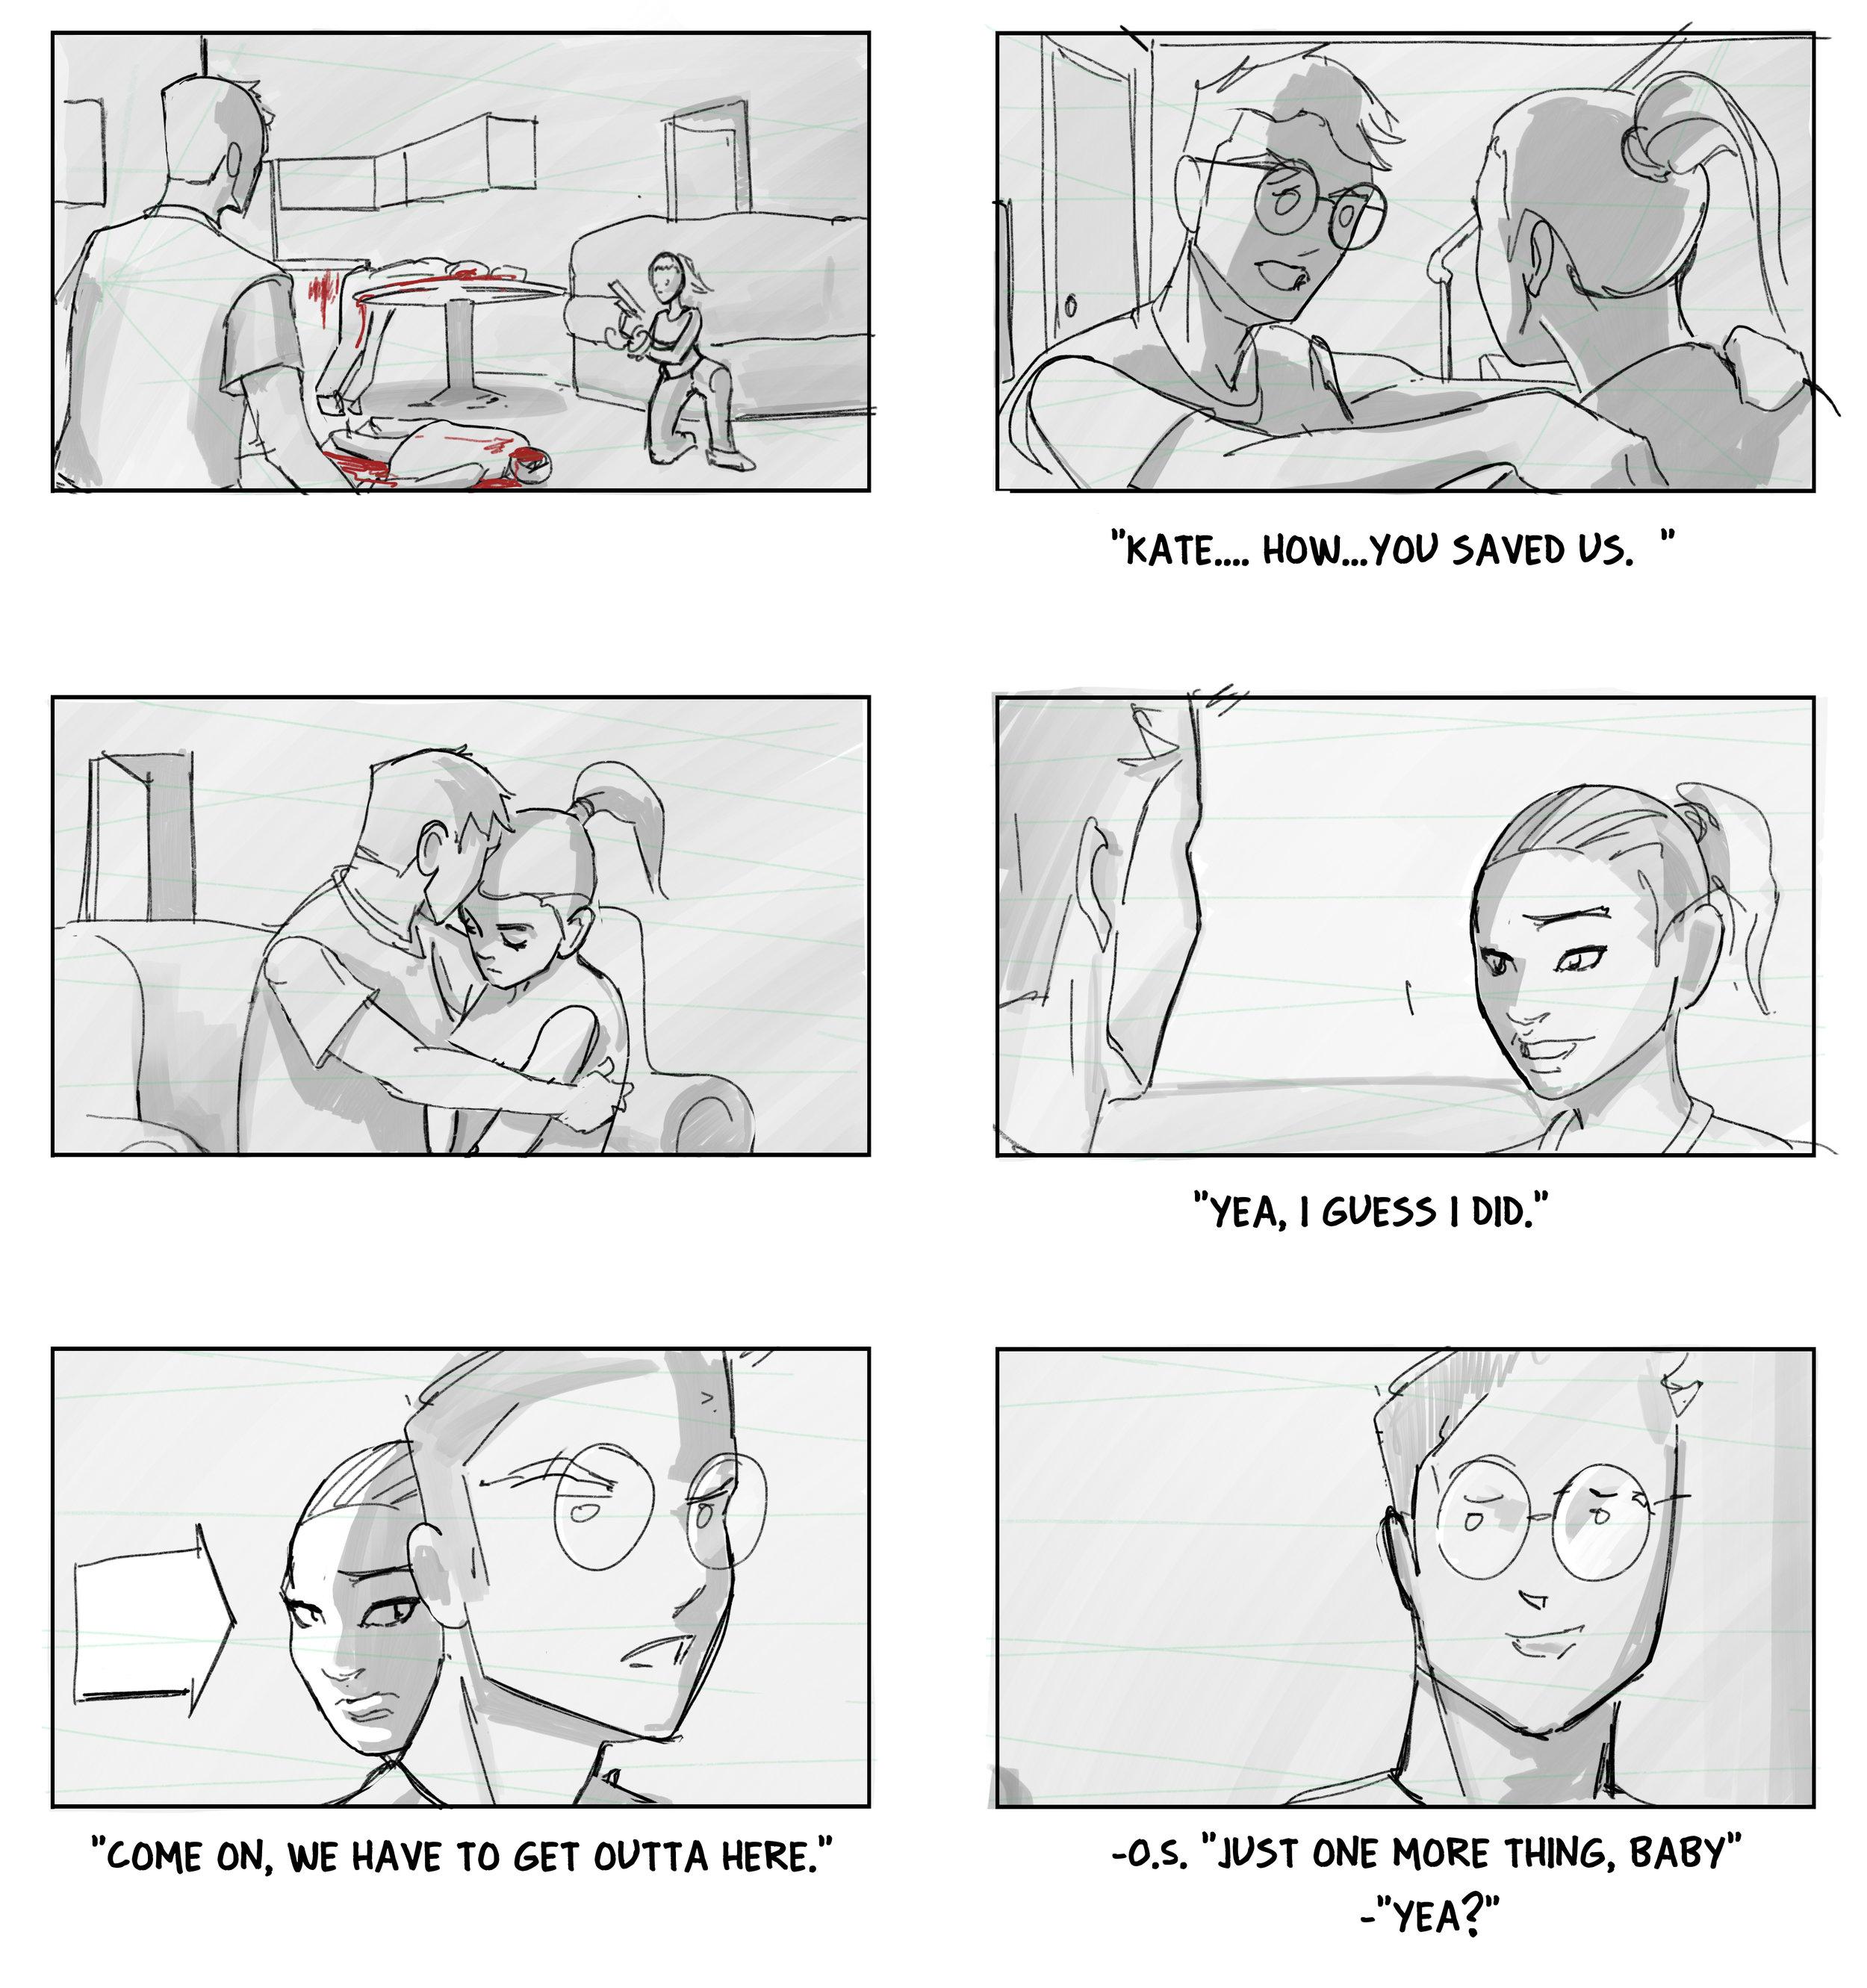 SAM_BS_Catapano_Storyboards_019.jpg